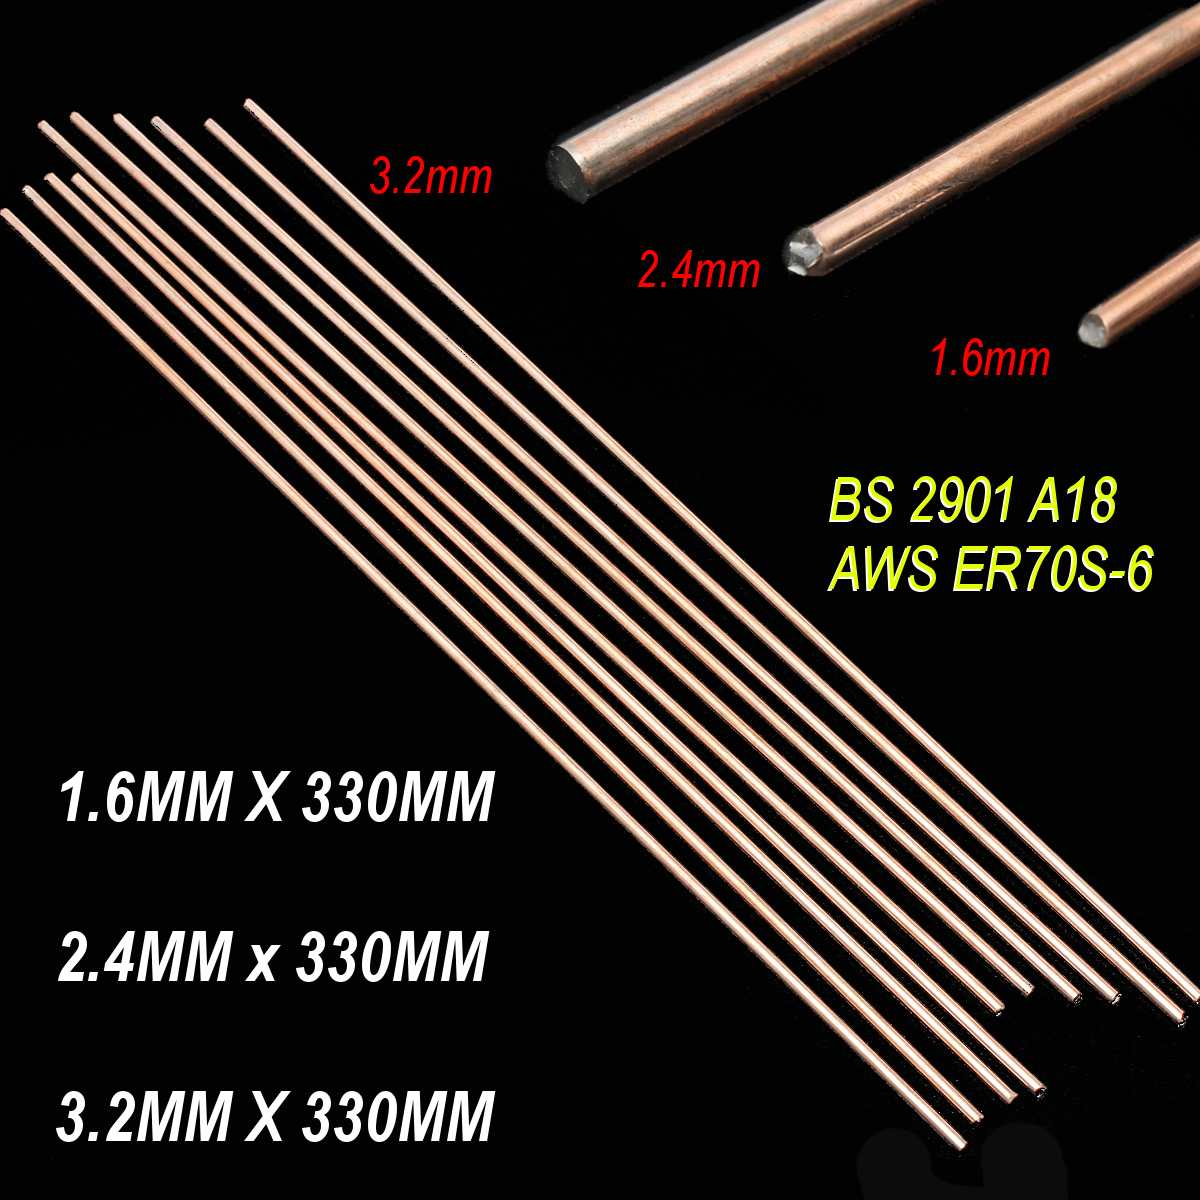 10pcs/set 1.6/2.4/3.2X330mm Red Copper Welding Brazing Wire Solder TIG Filler Rod A18 Steel Mild Steel